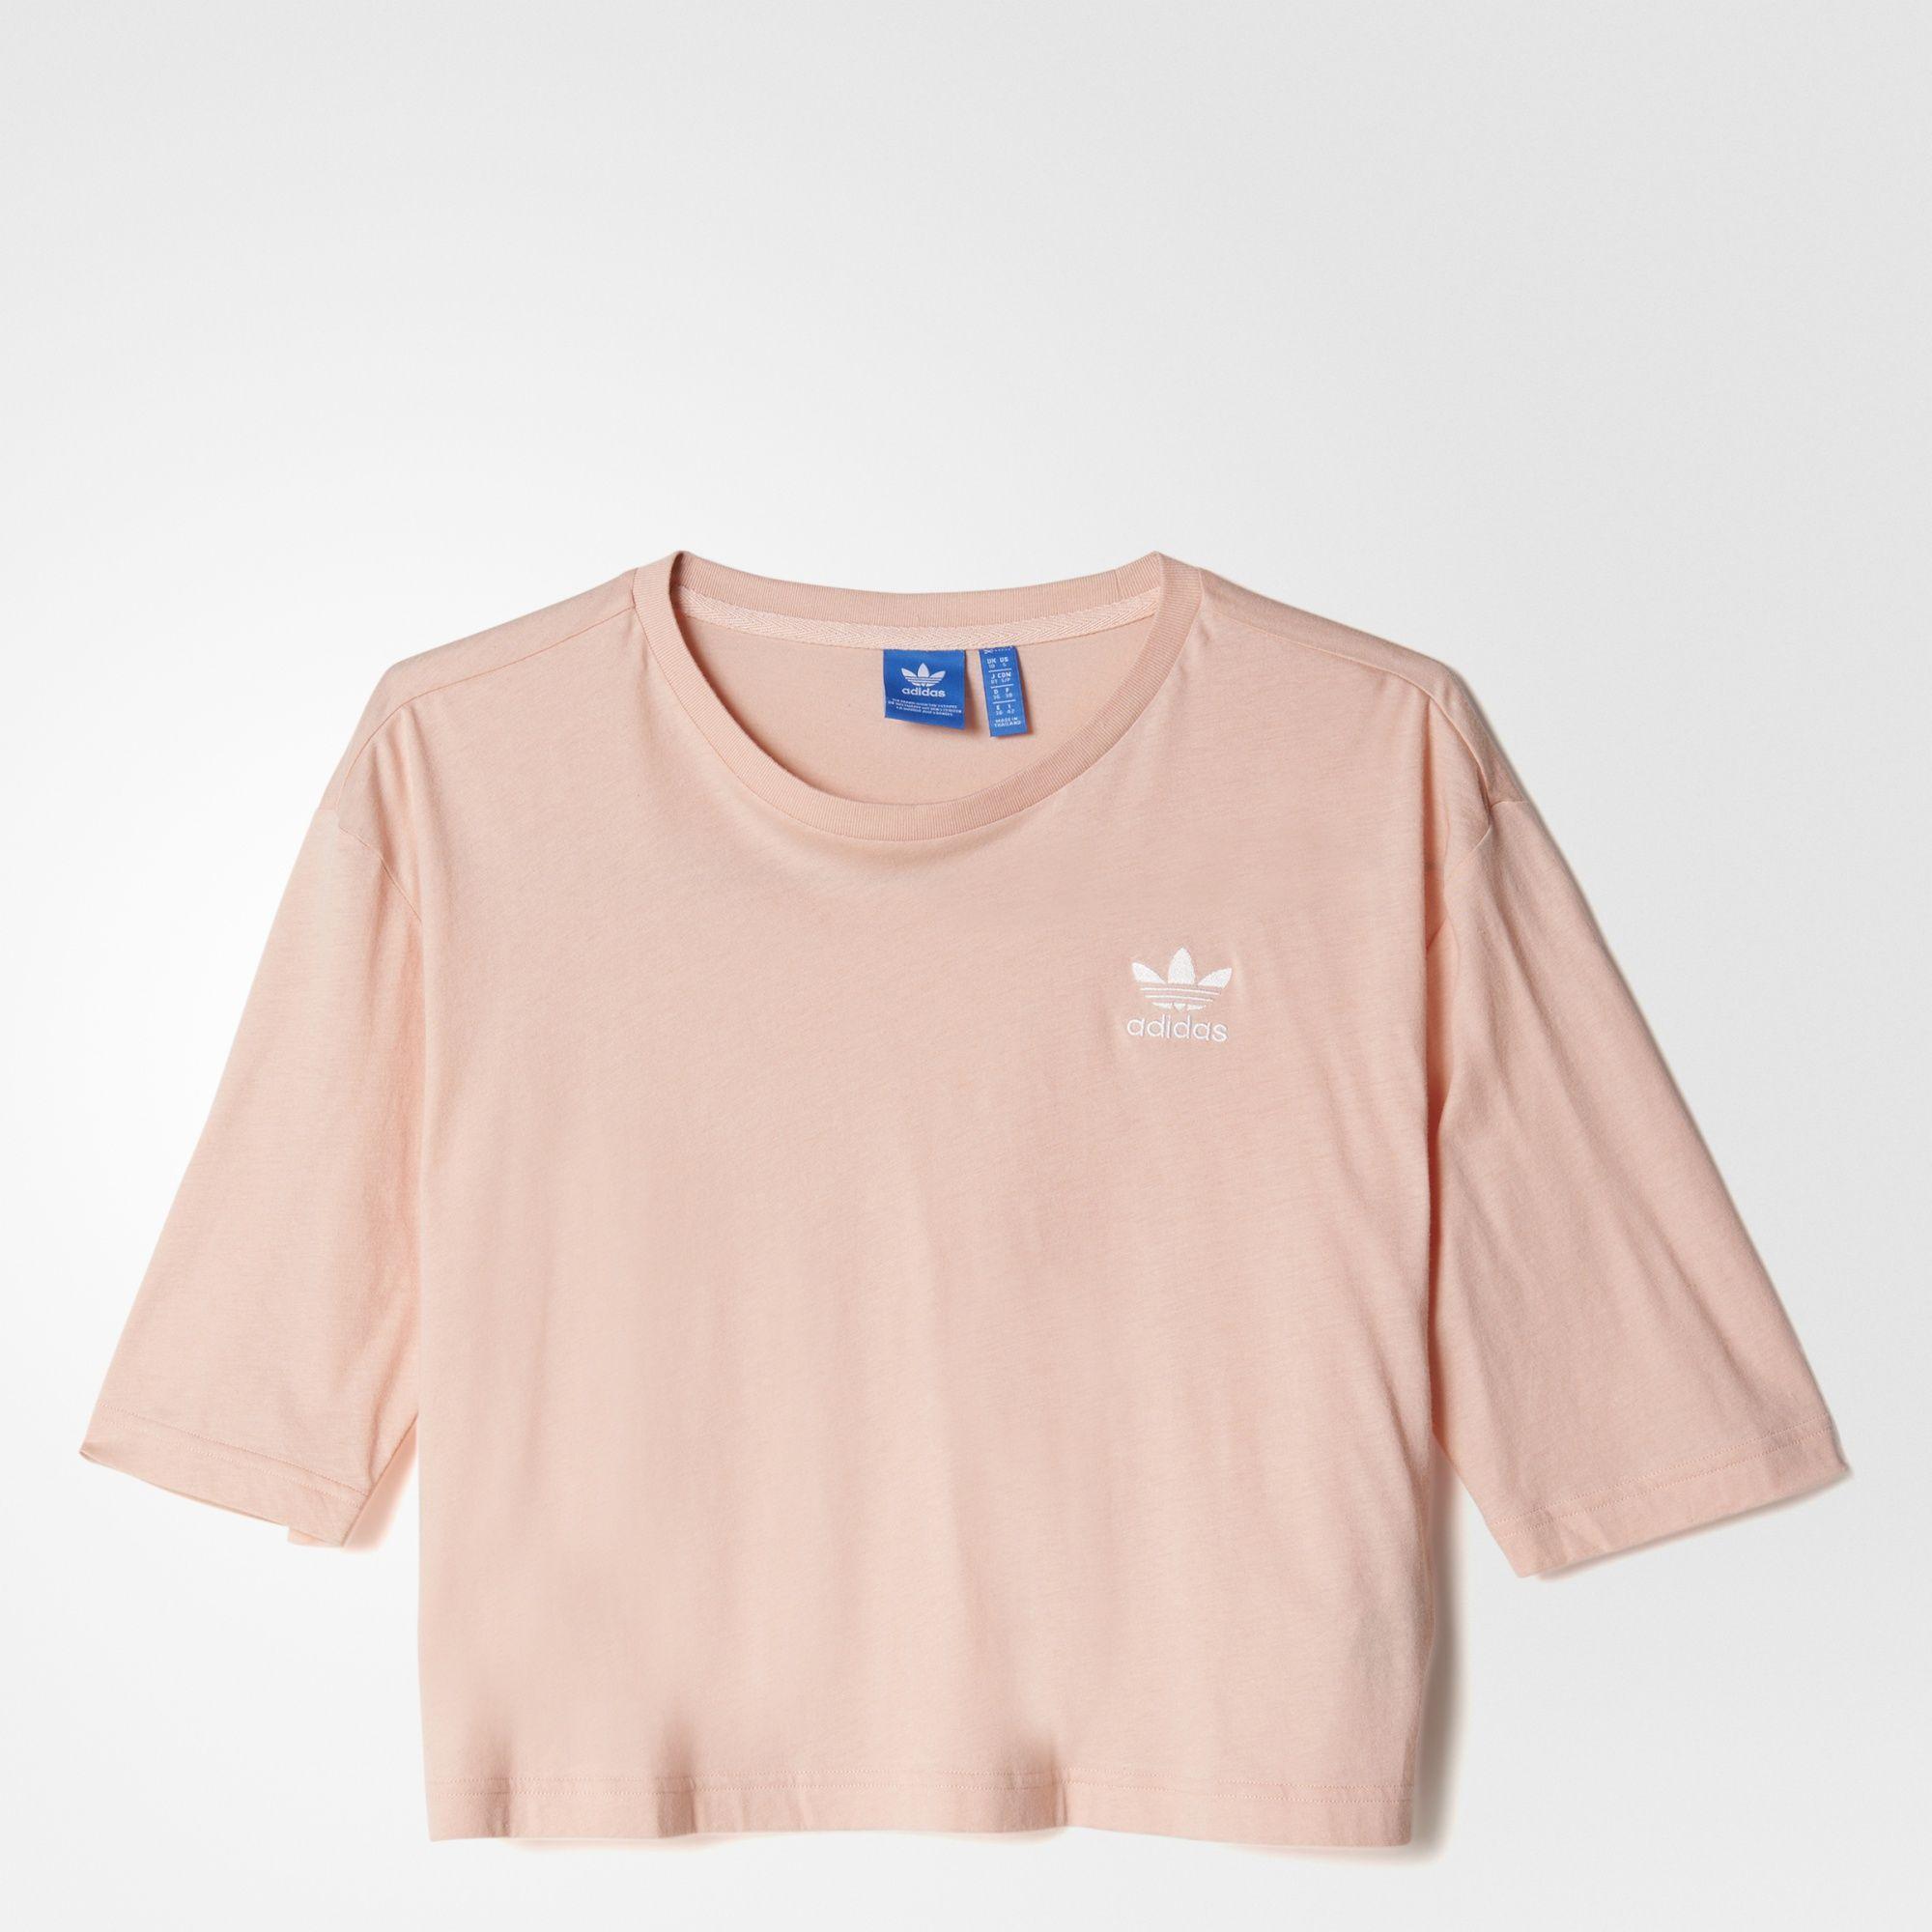 adidas Originals Pastel Camo Relaxed Fit T Shirt Women's